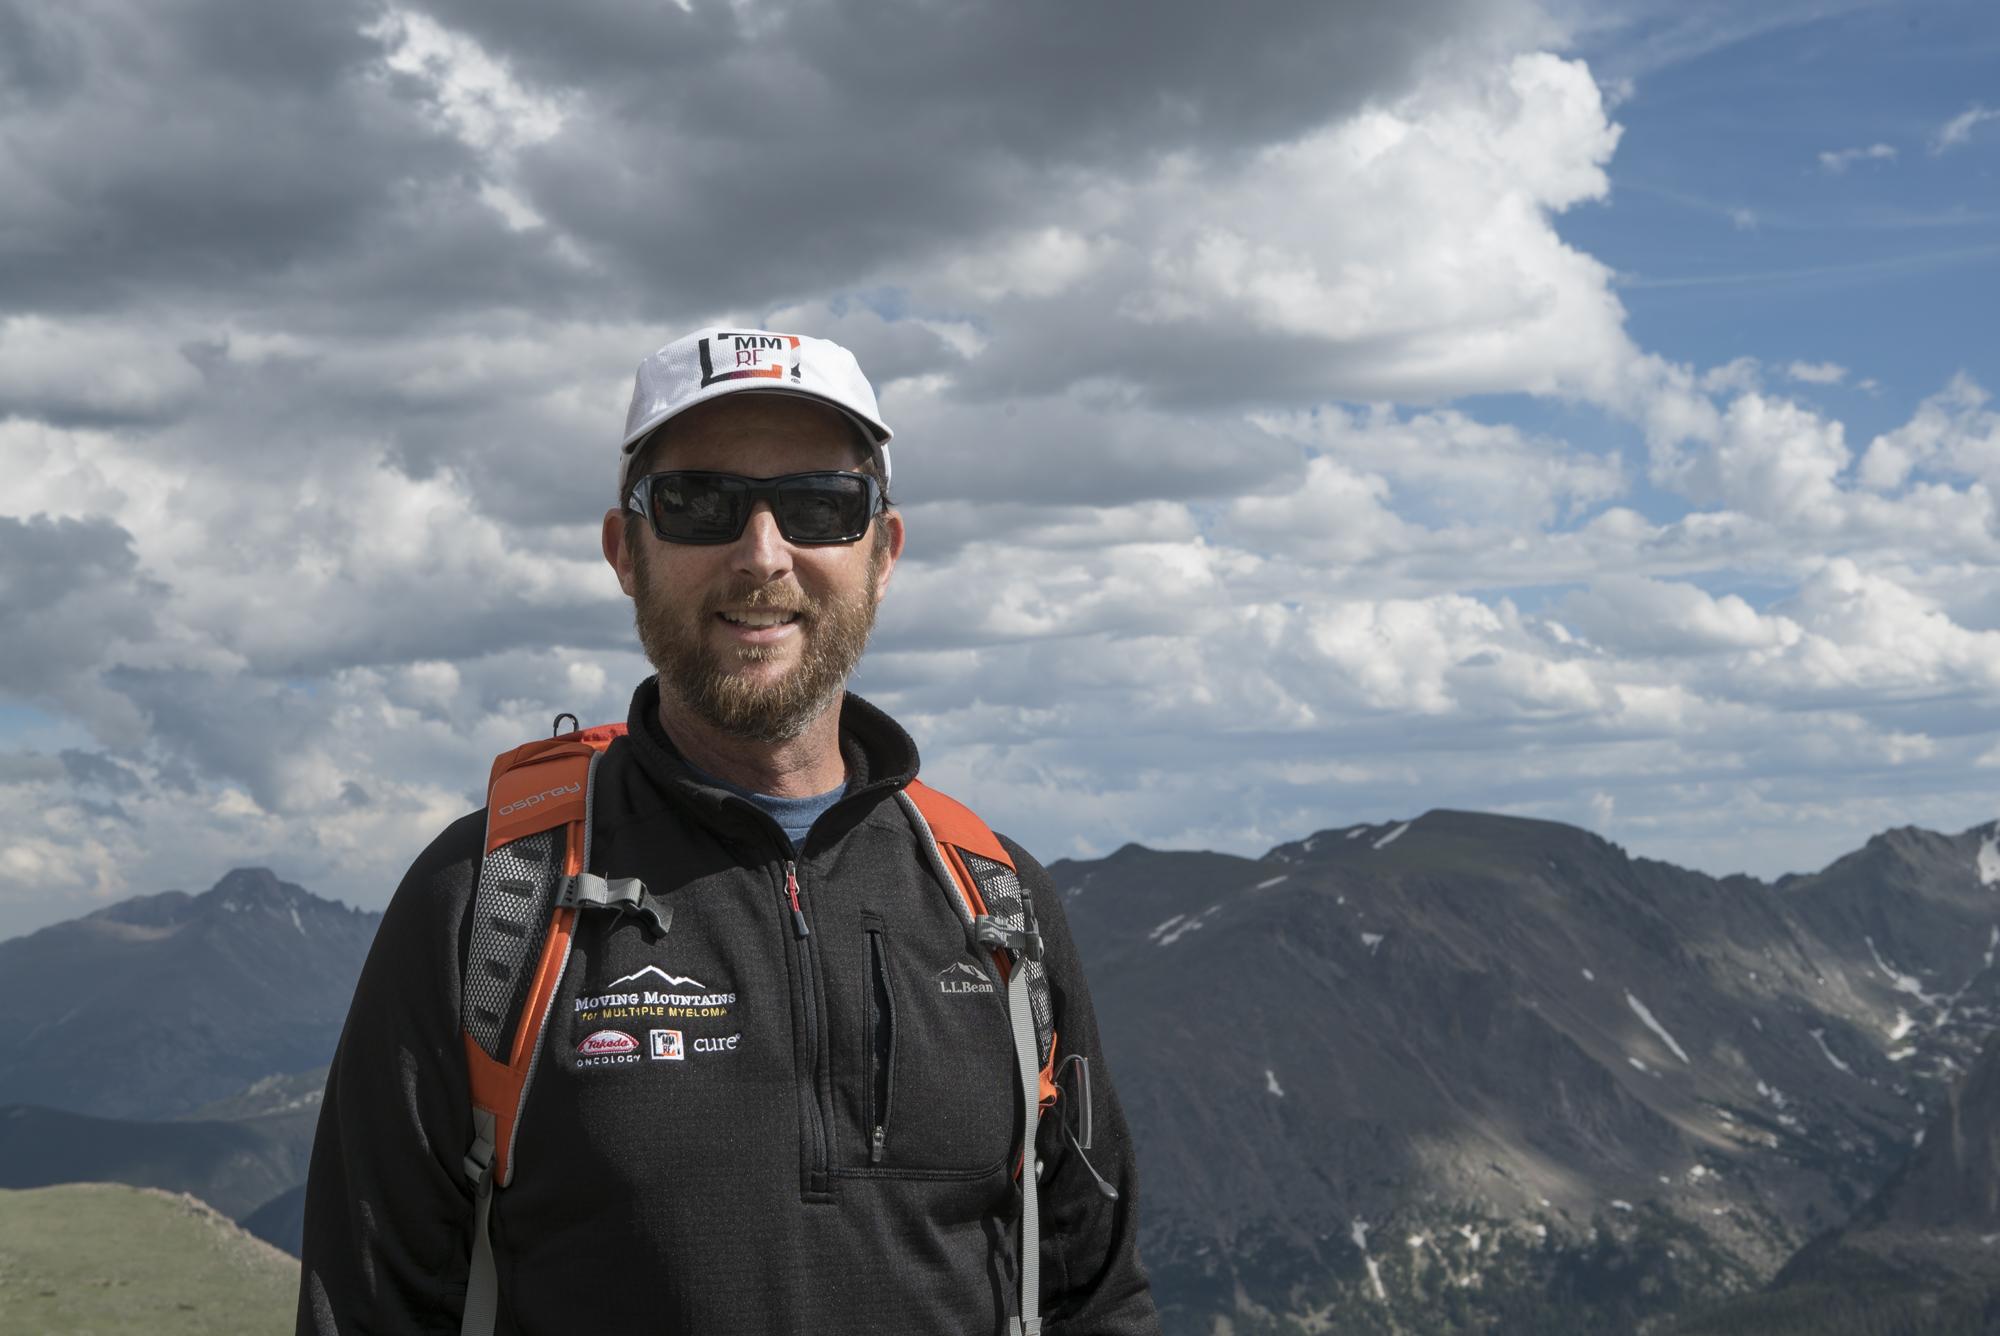 Climbing Mt Kilimanjaro for MMRF: Cure Panelist and Myeloma Survivor Matt Goldman